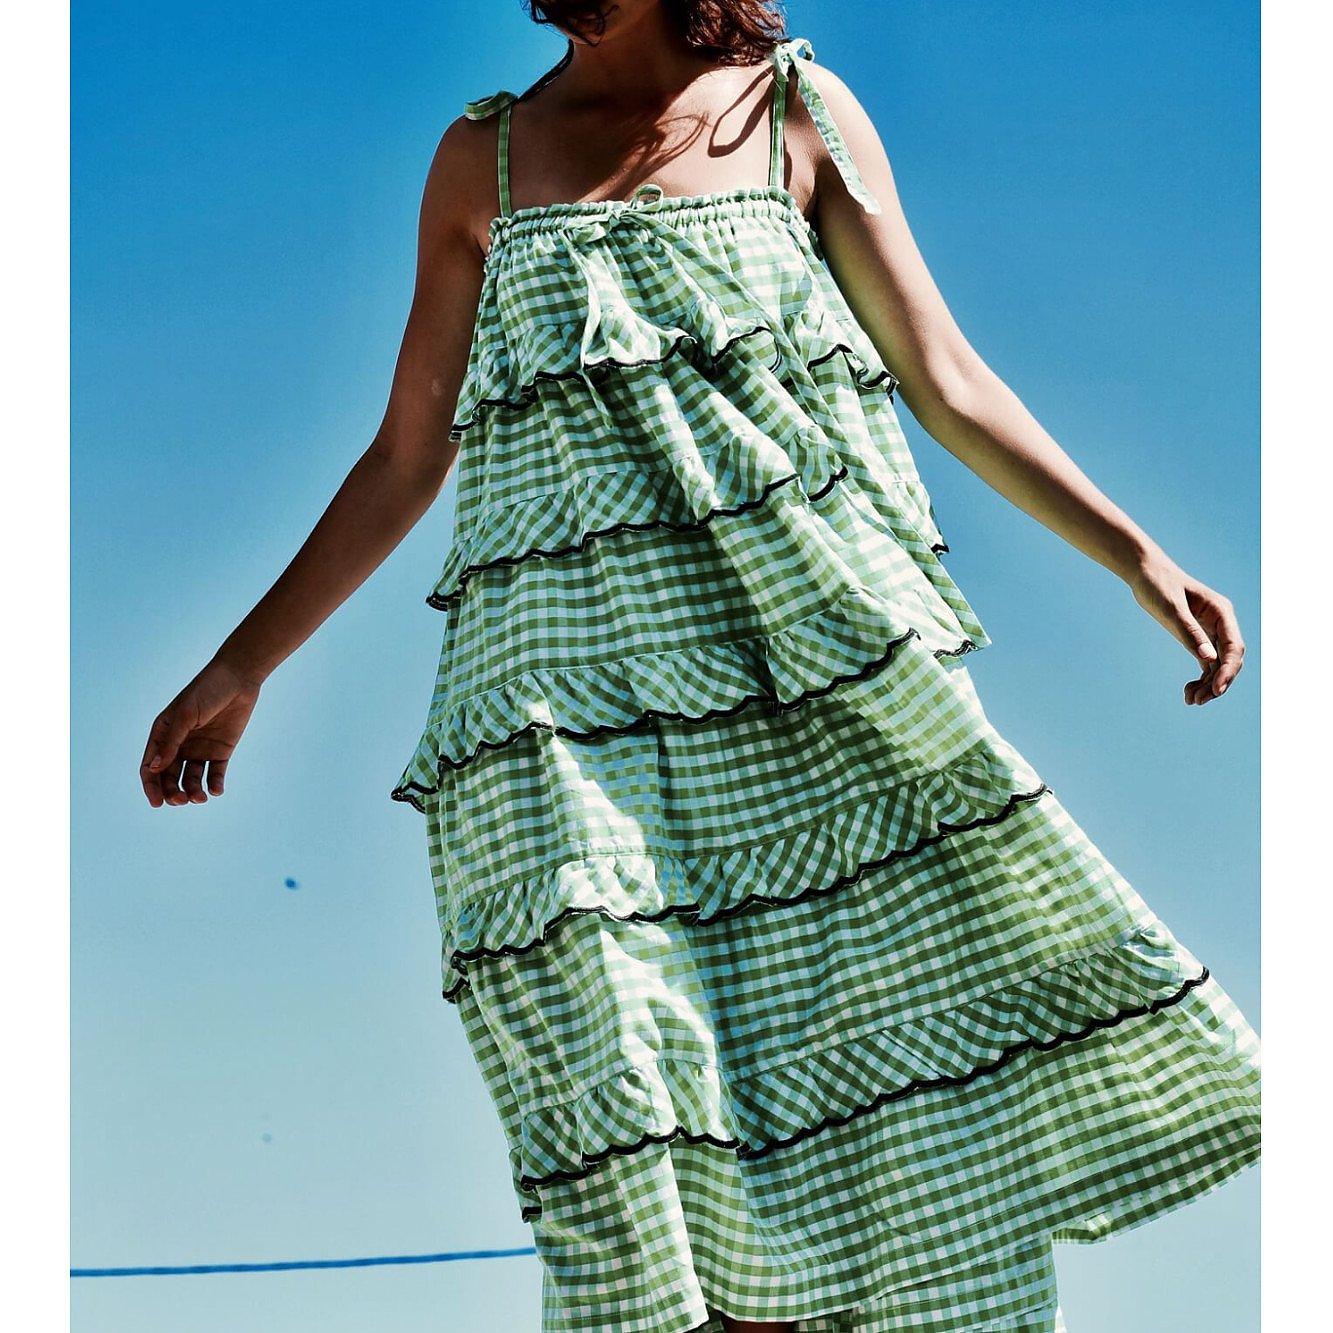 Innika Choo Avens Gingham Dress